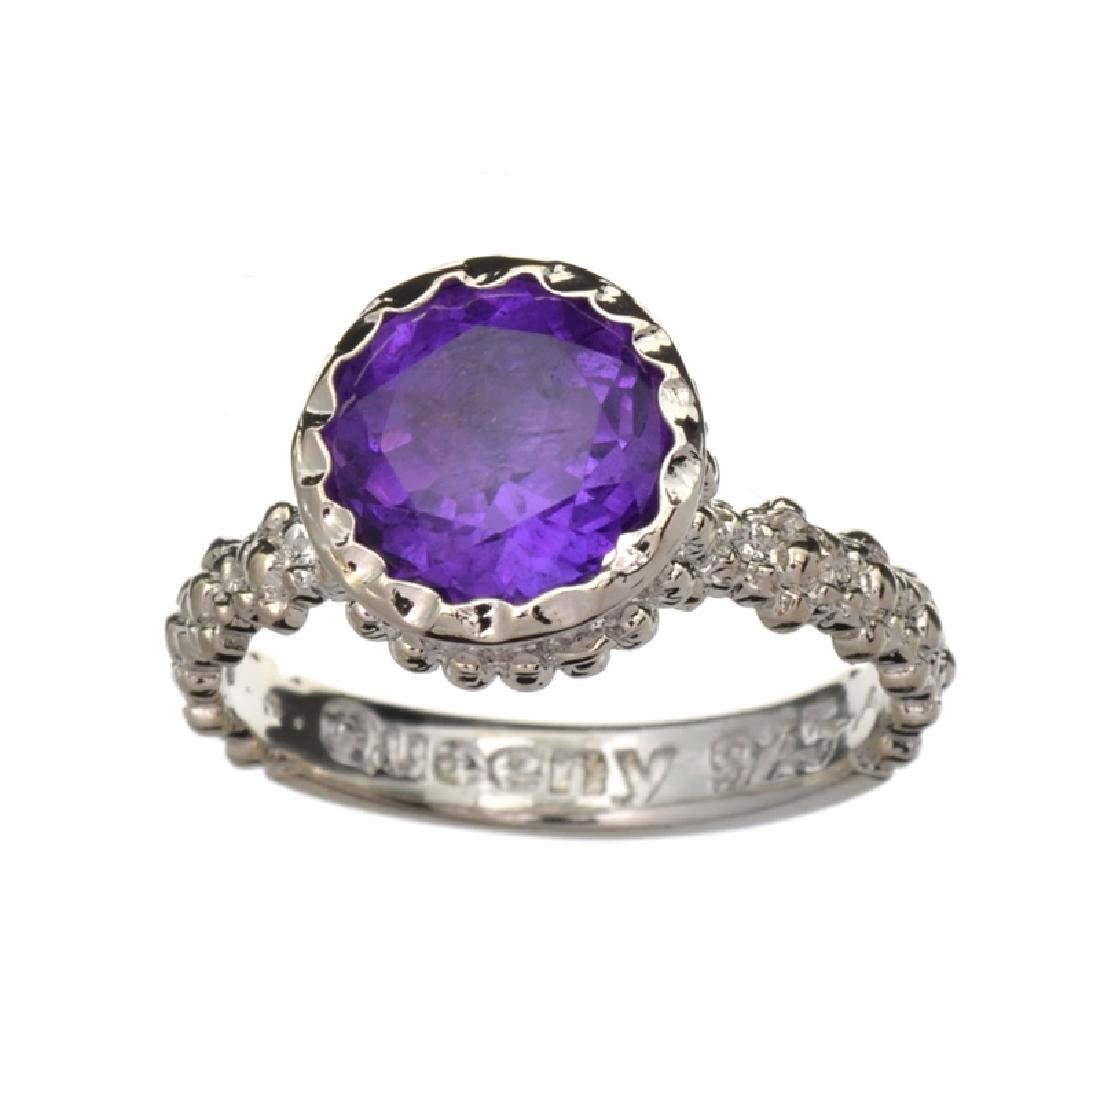 APP: 0.7k Fine Jewelry 1.50CT Round Cut Amethyst Quartz